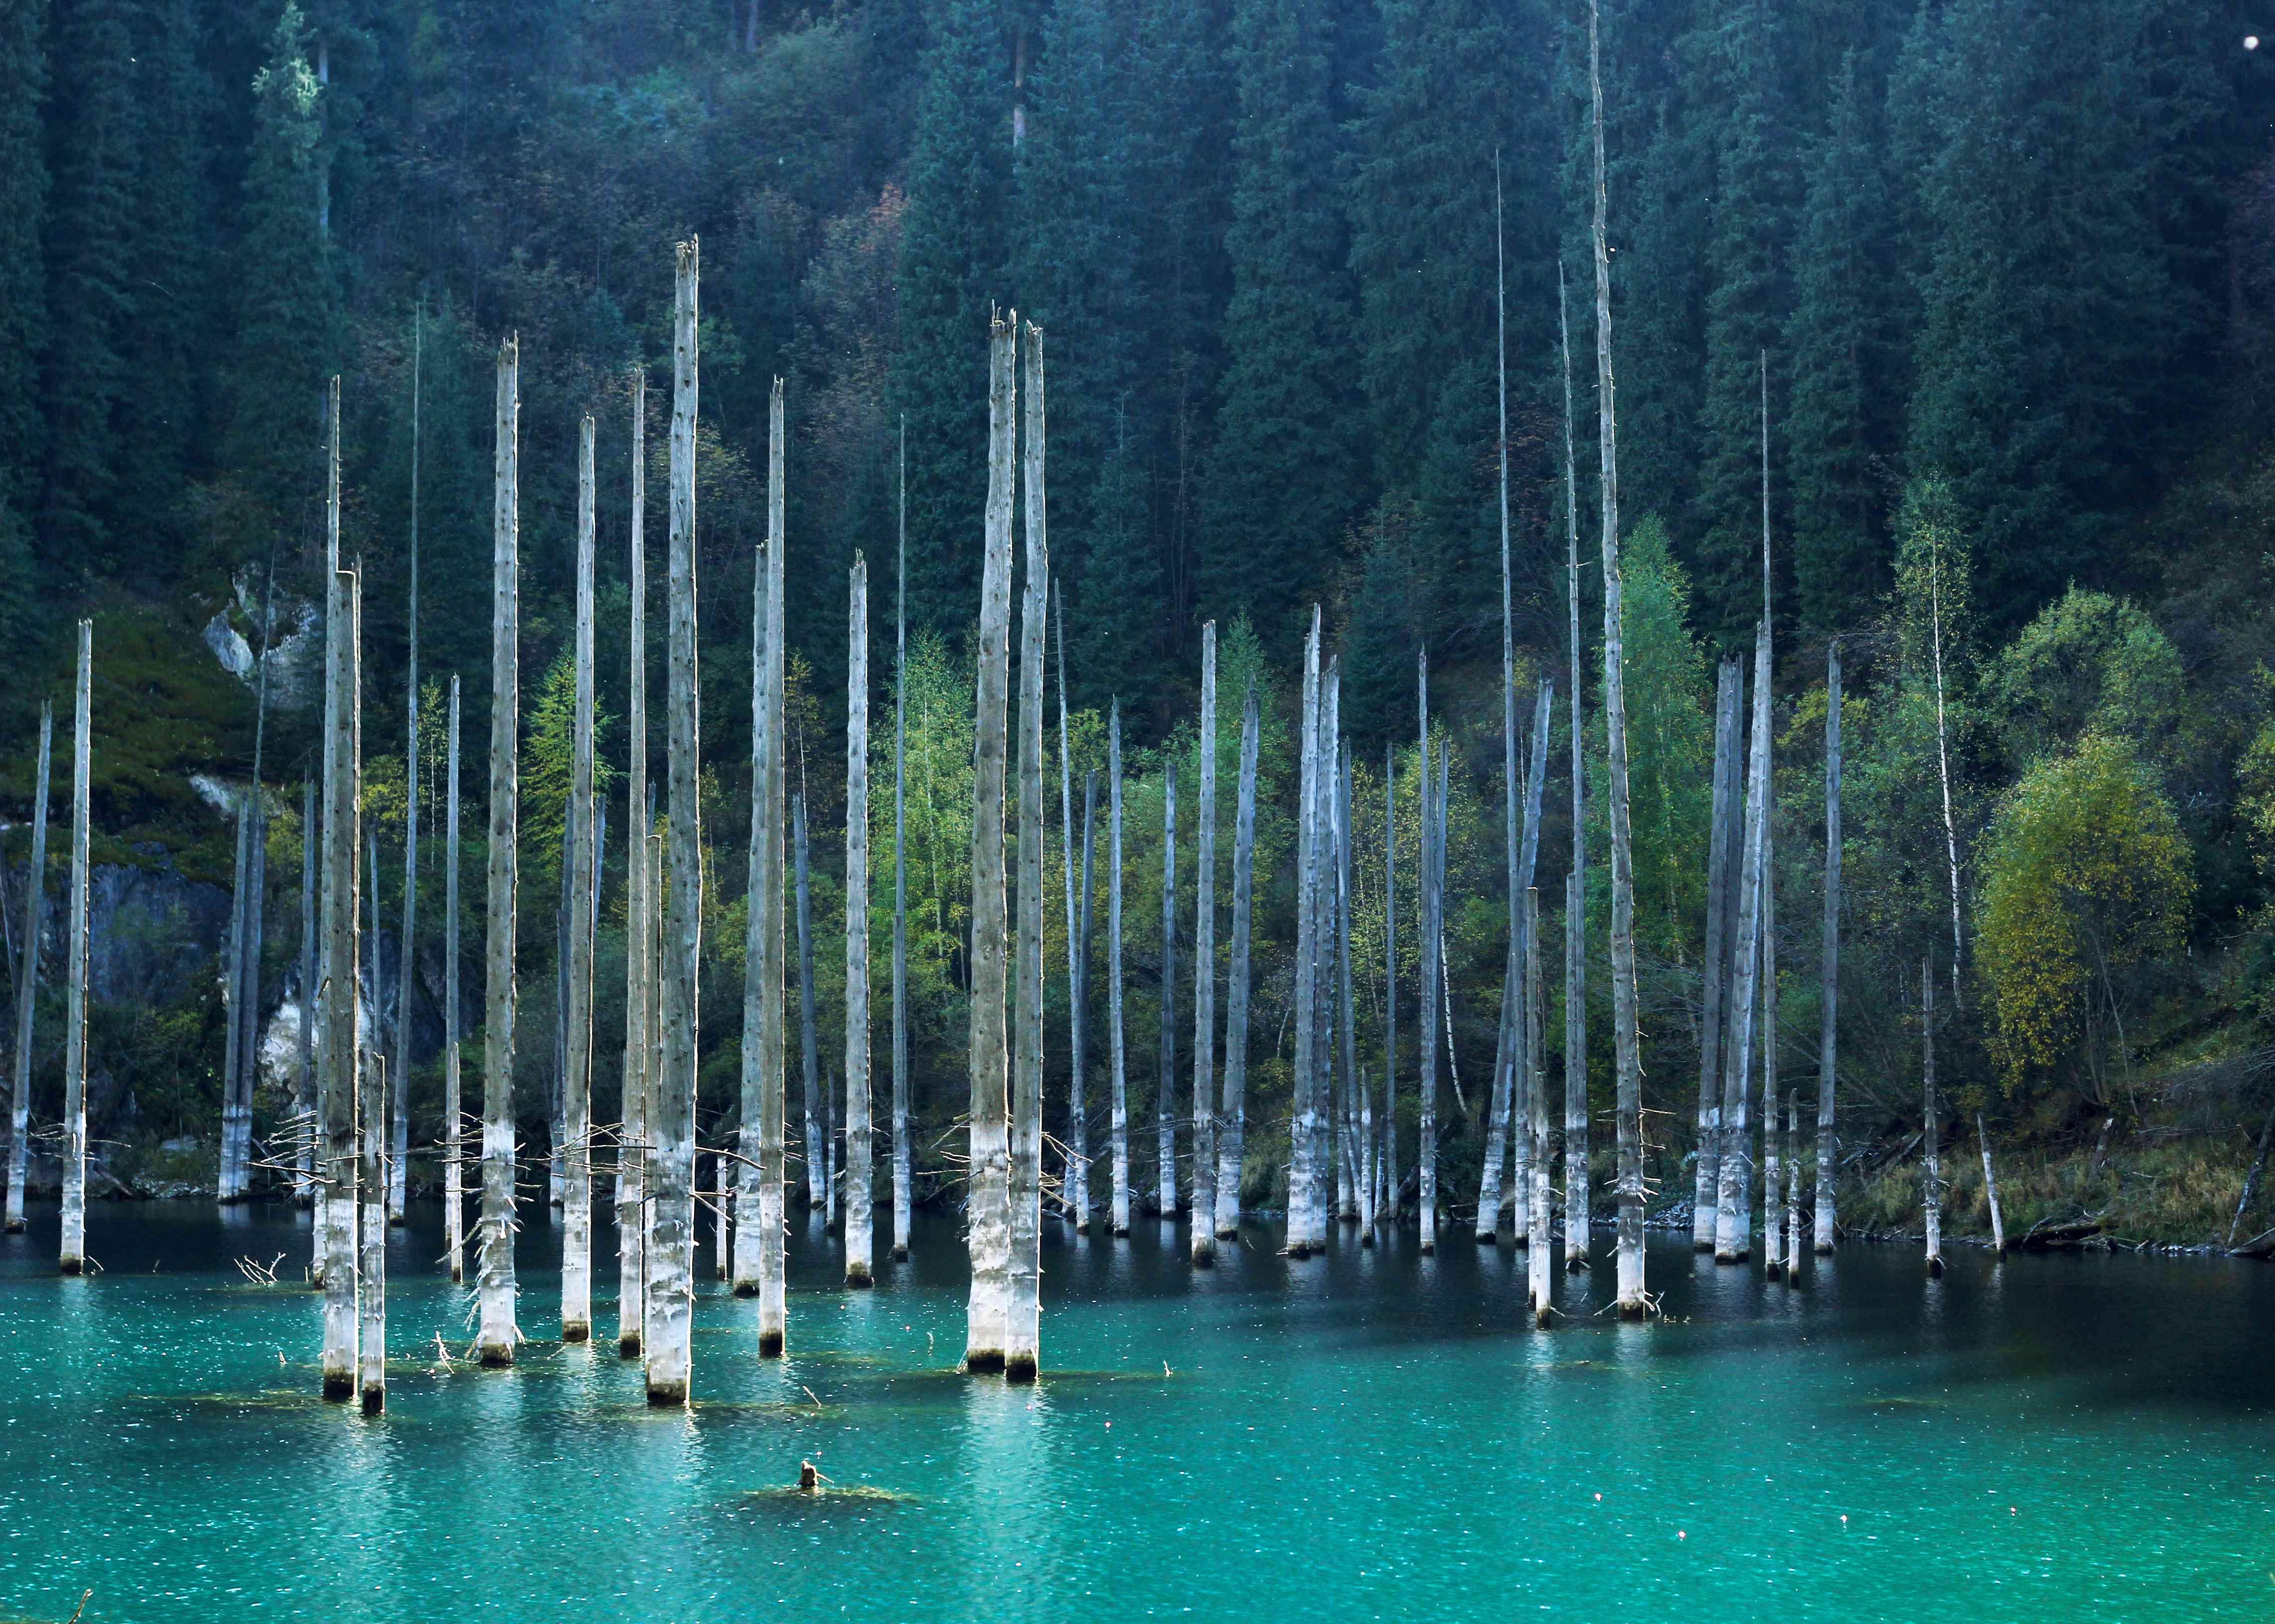 Sunken birch trees in the vividly blue Kaindy Lake